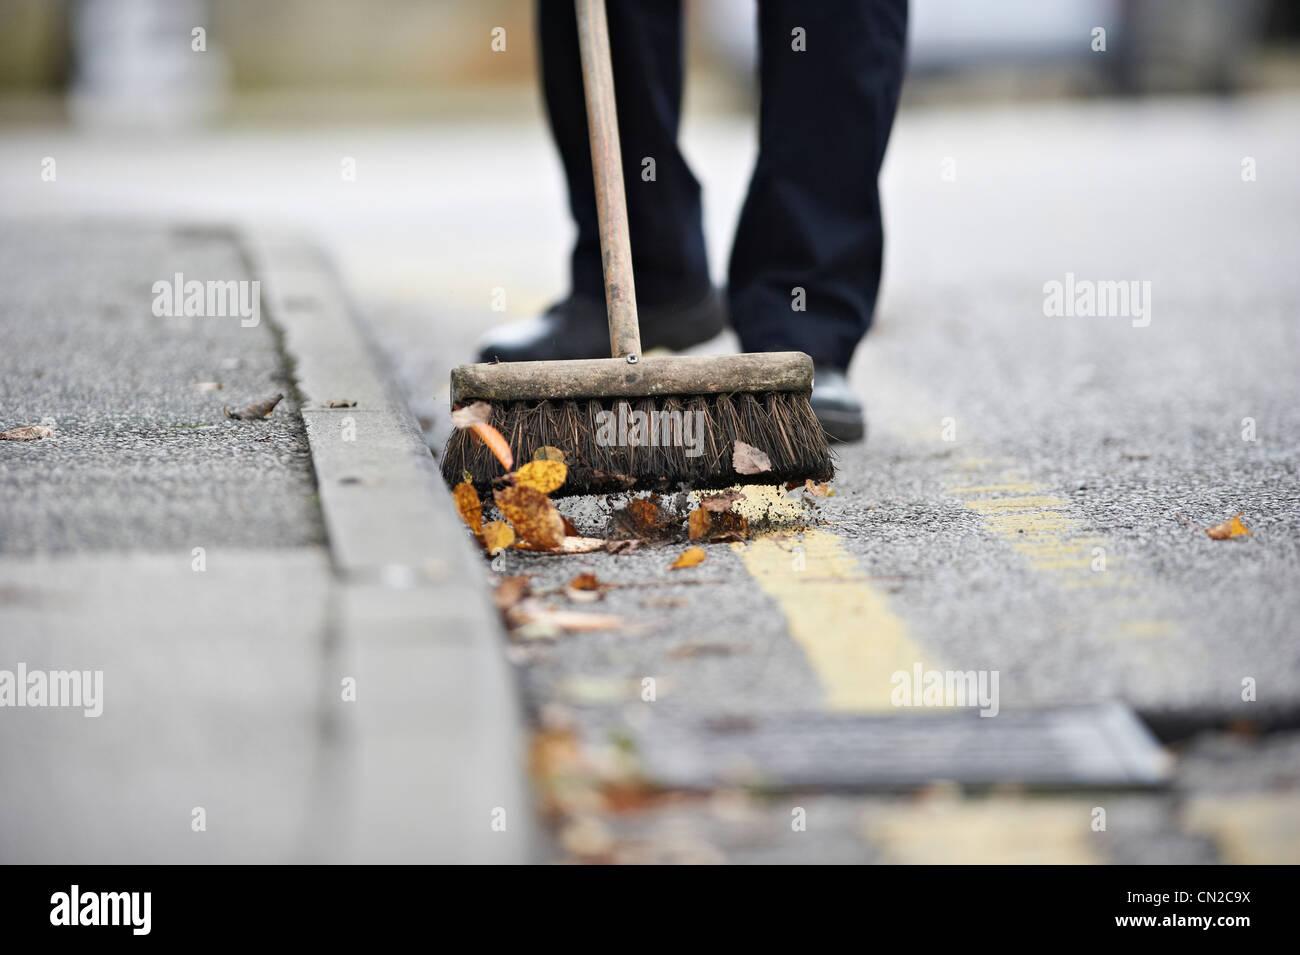 Spazzatrice stradale Immagini Stock